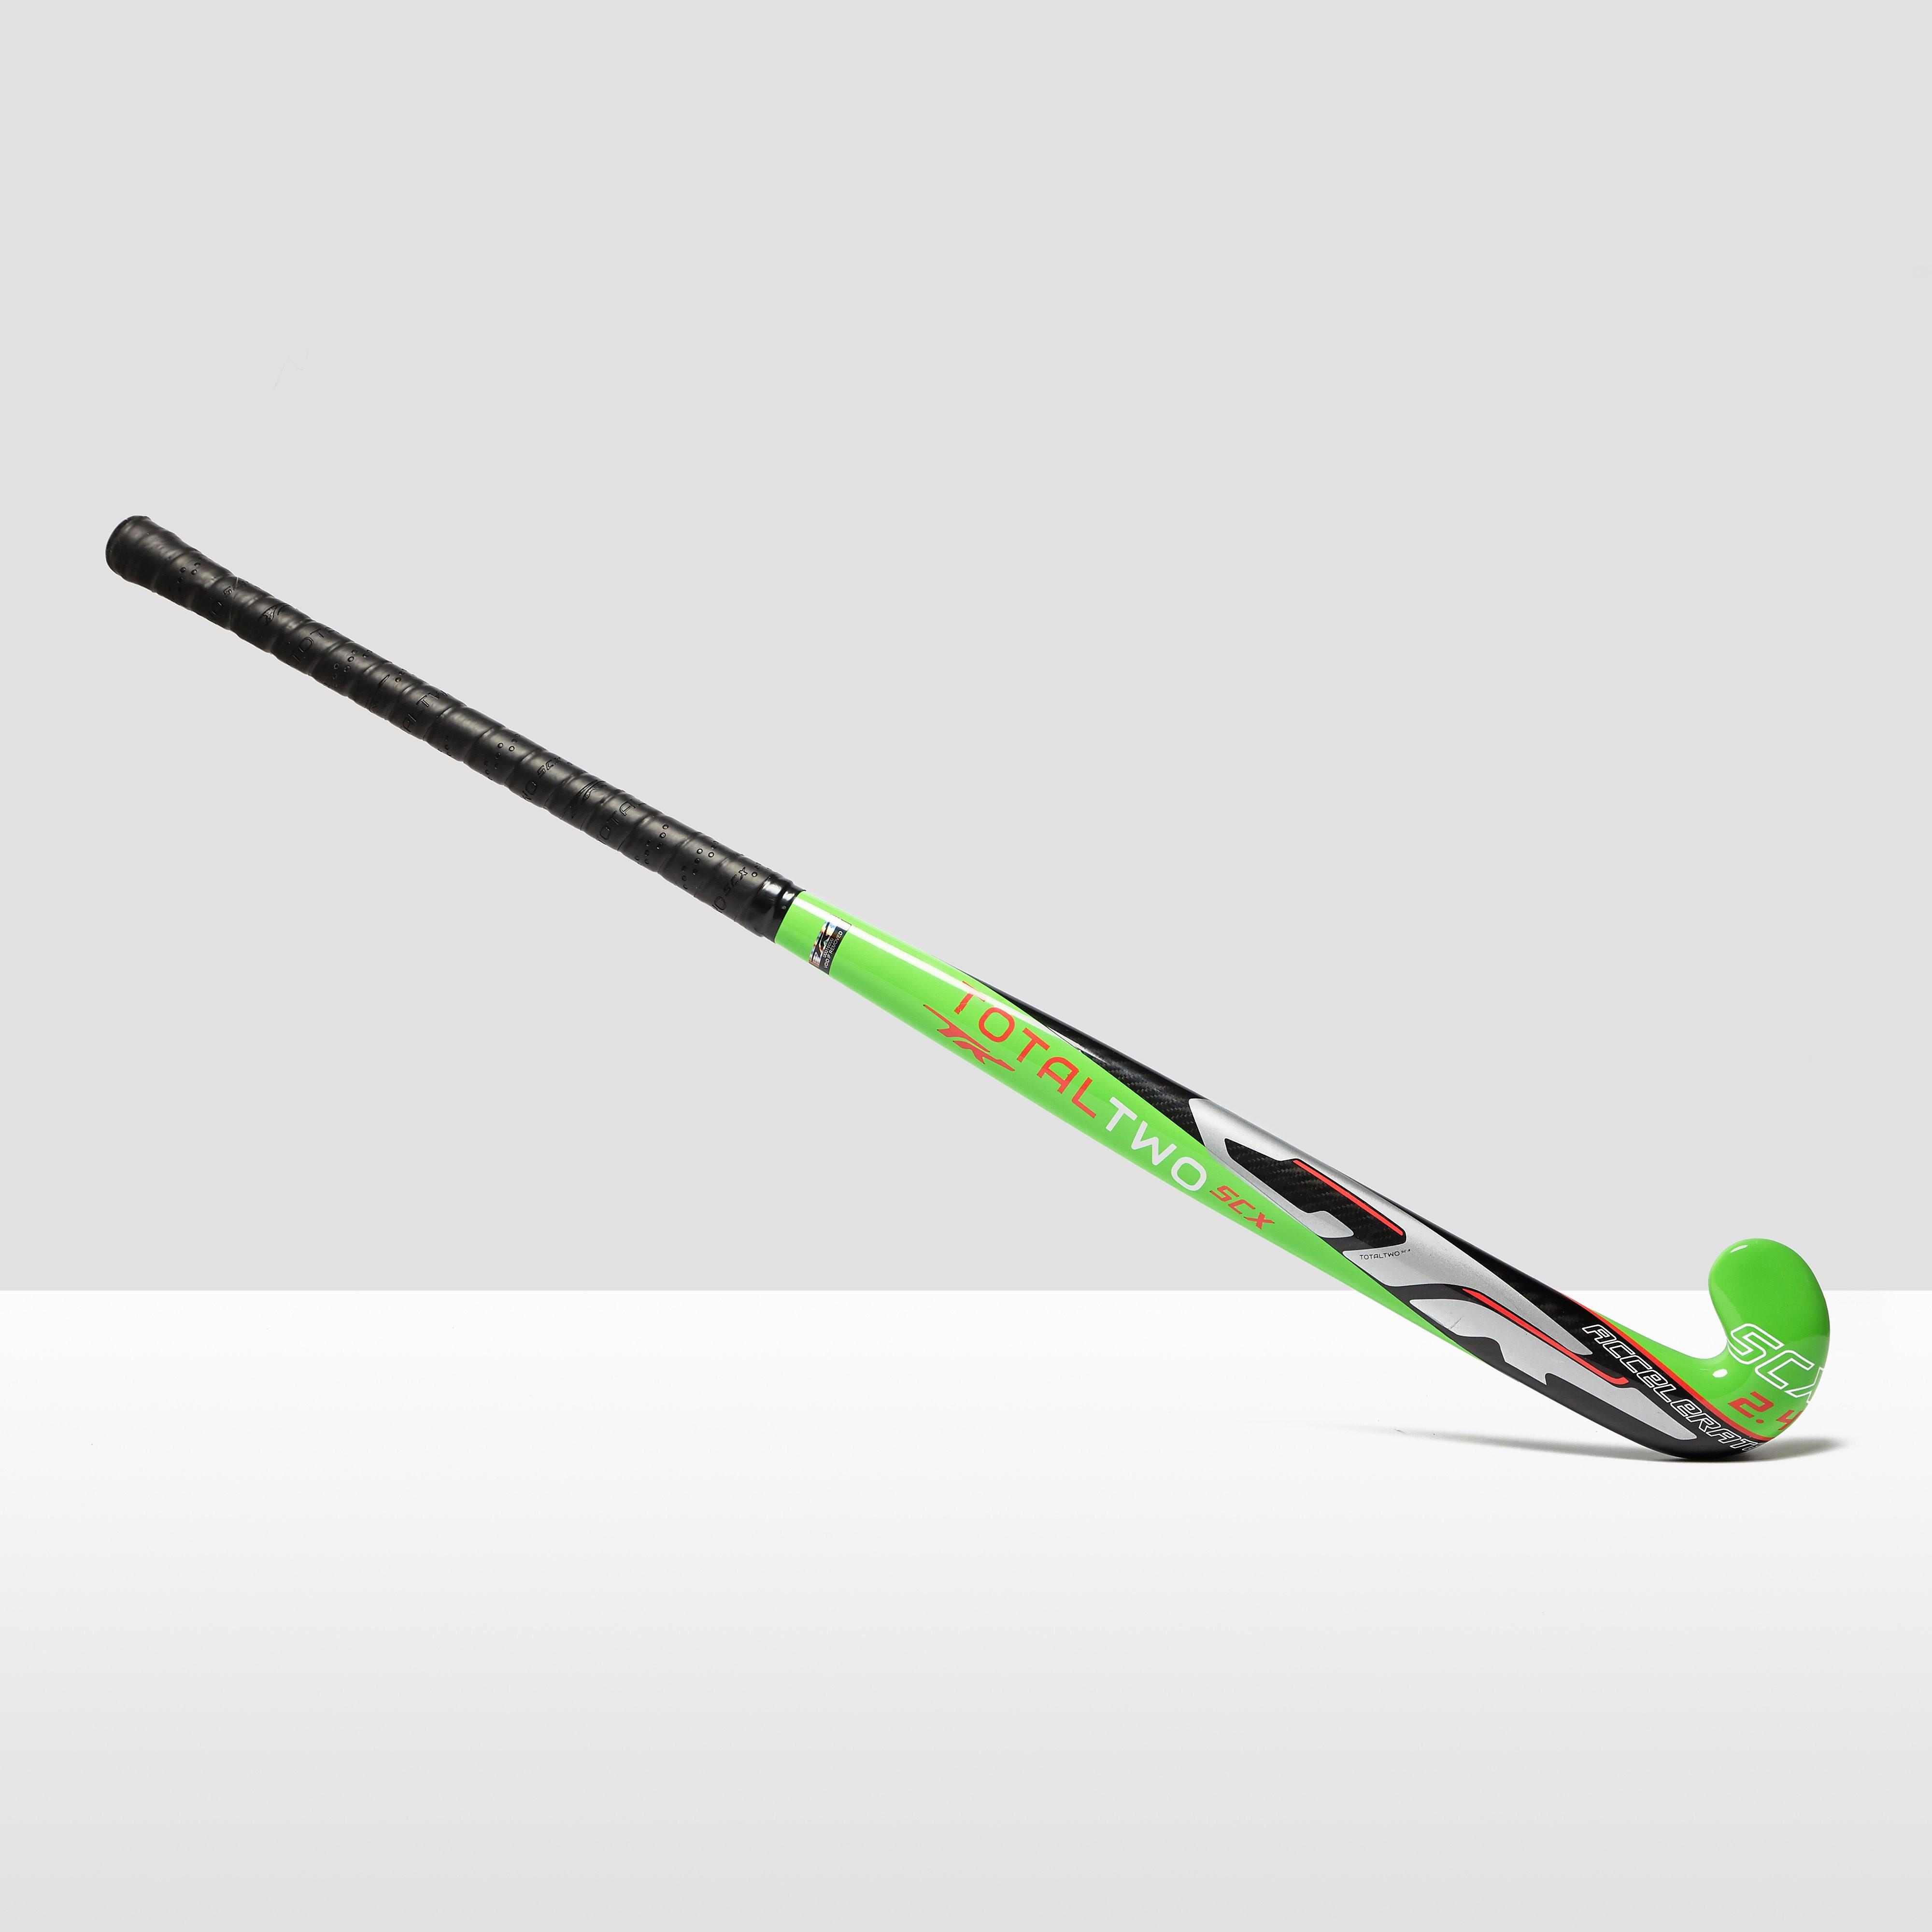 TK Hockey Total Two SCX 2.4 Accelerate Hockey Stick